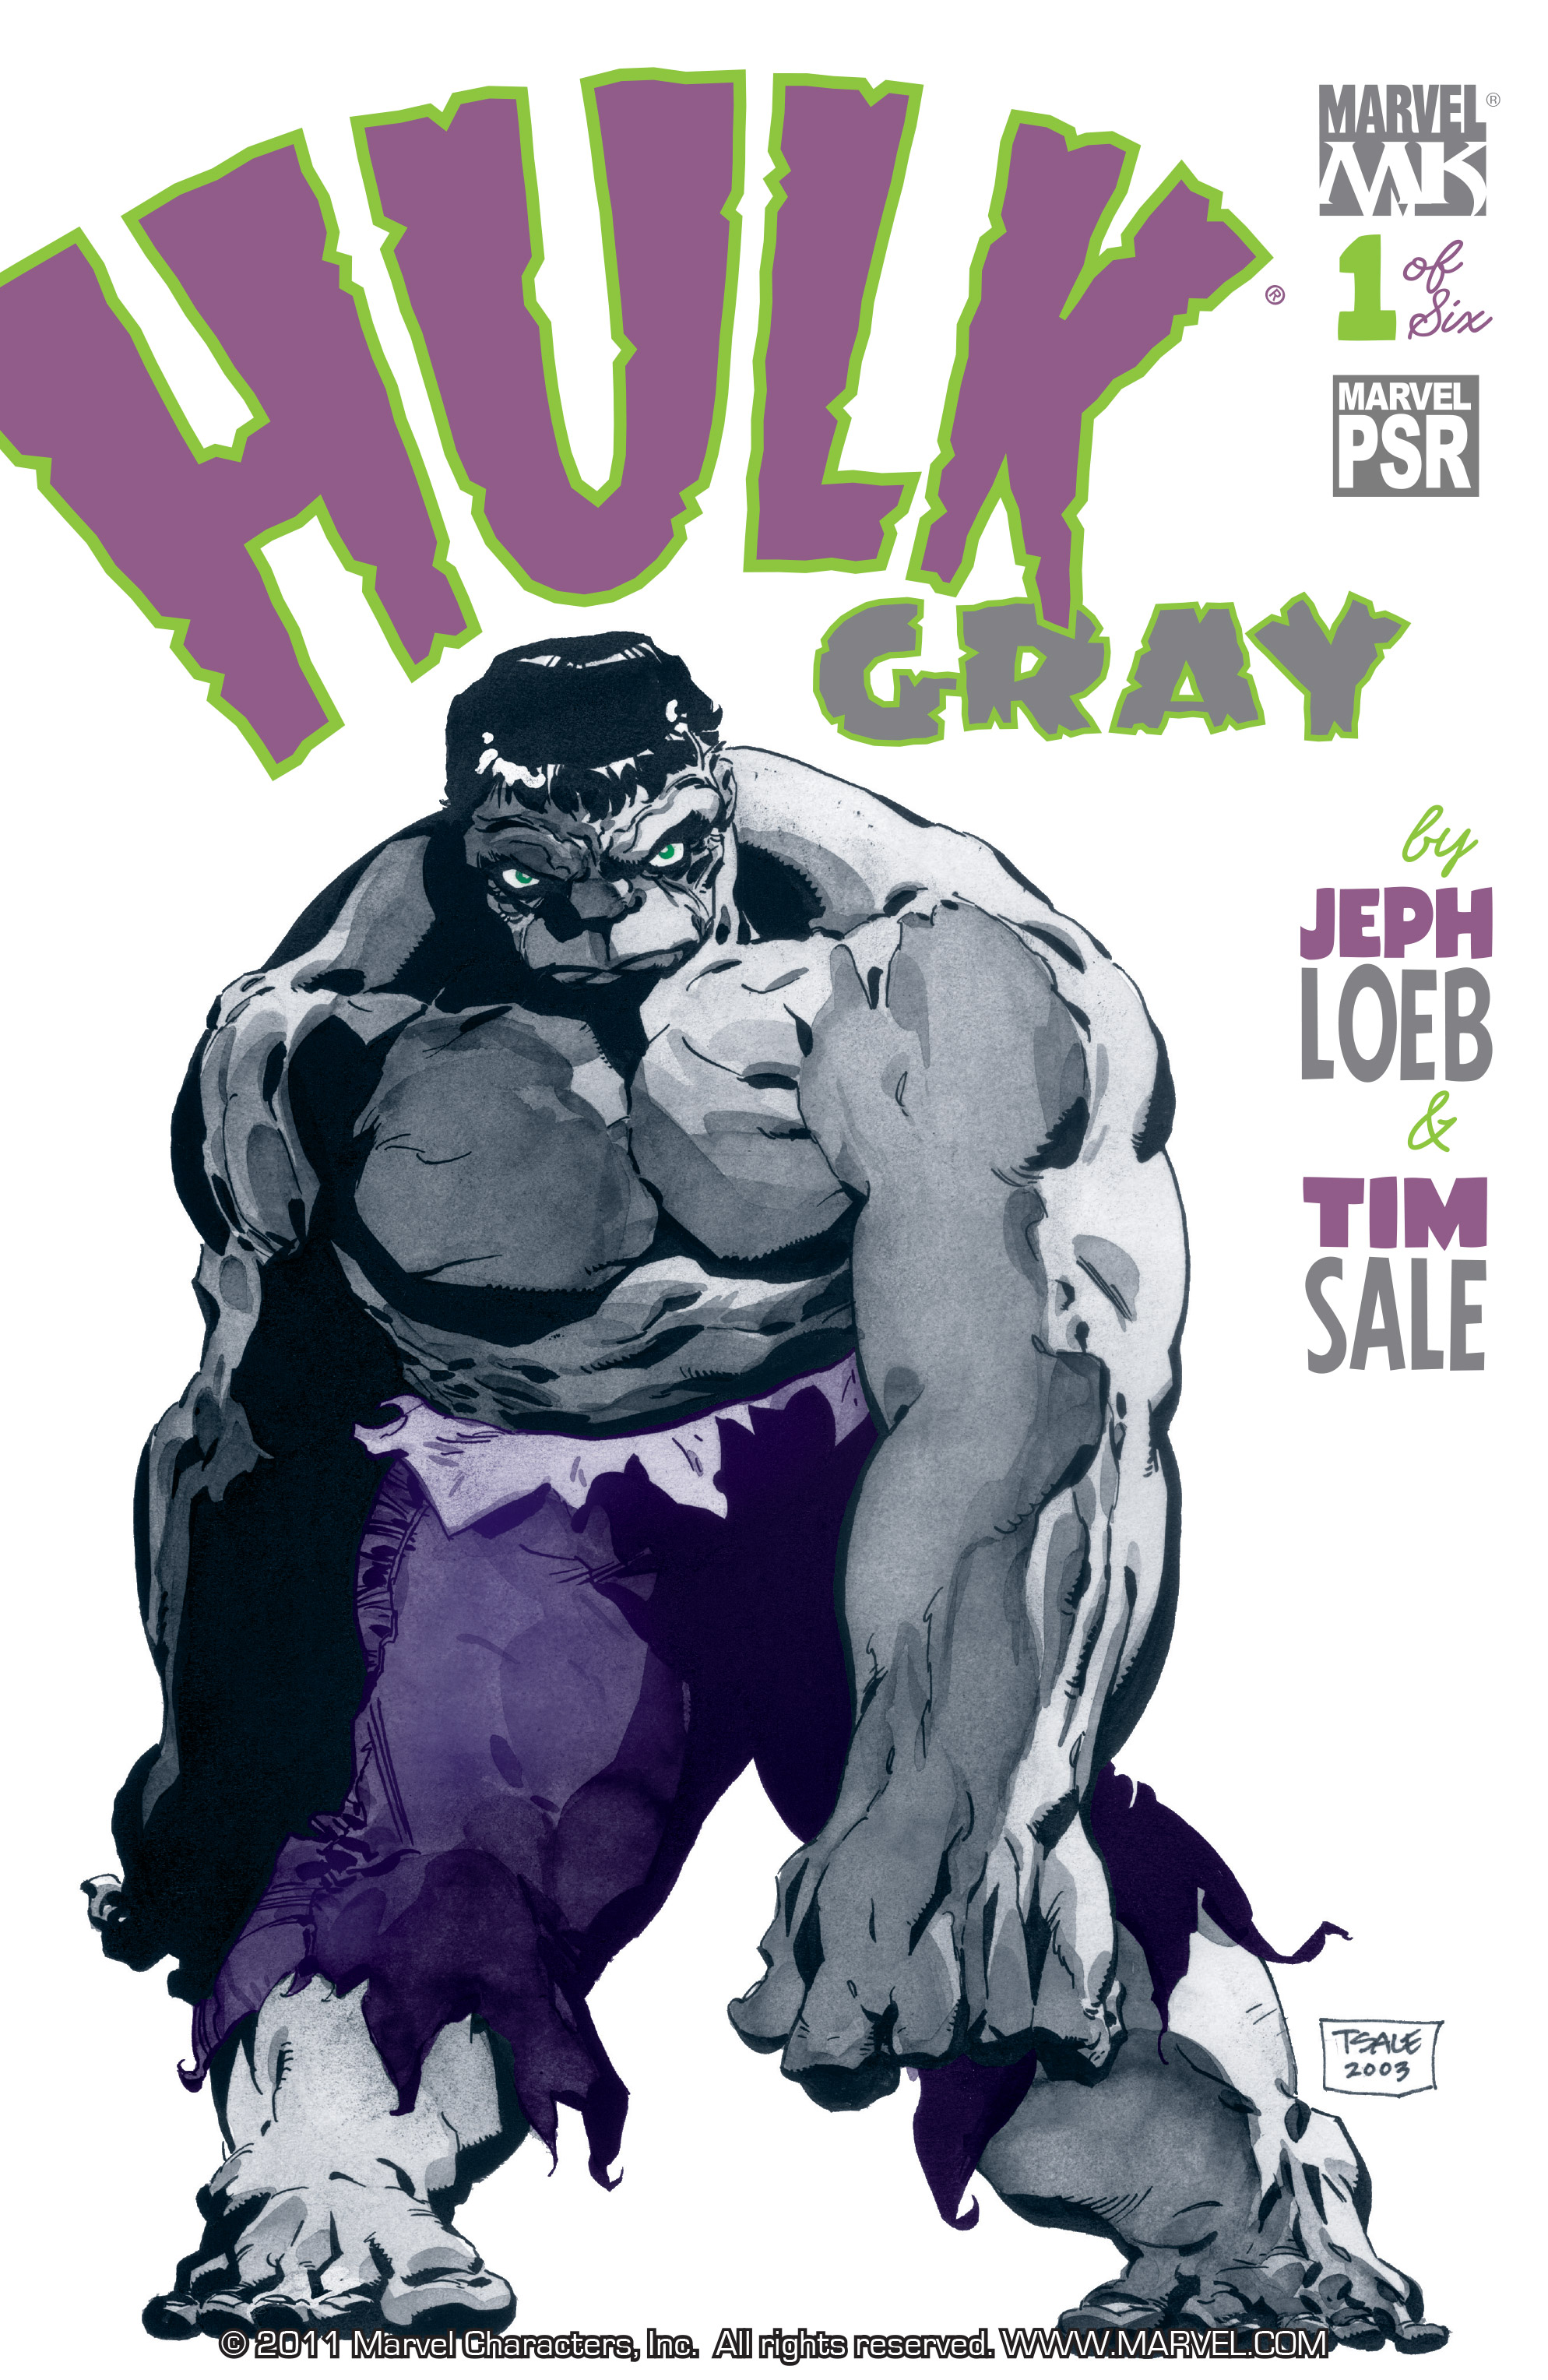 Read online Hulk: Gray comic -  Issue #1 - 1